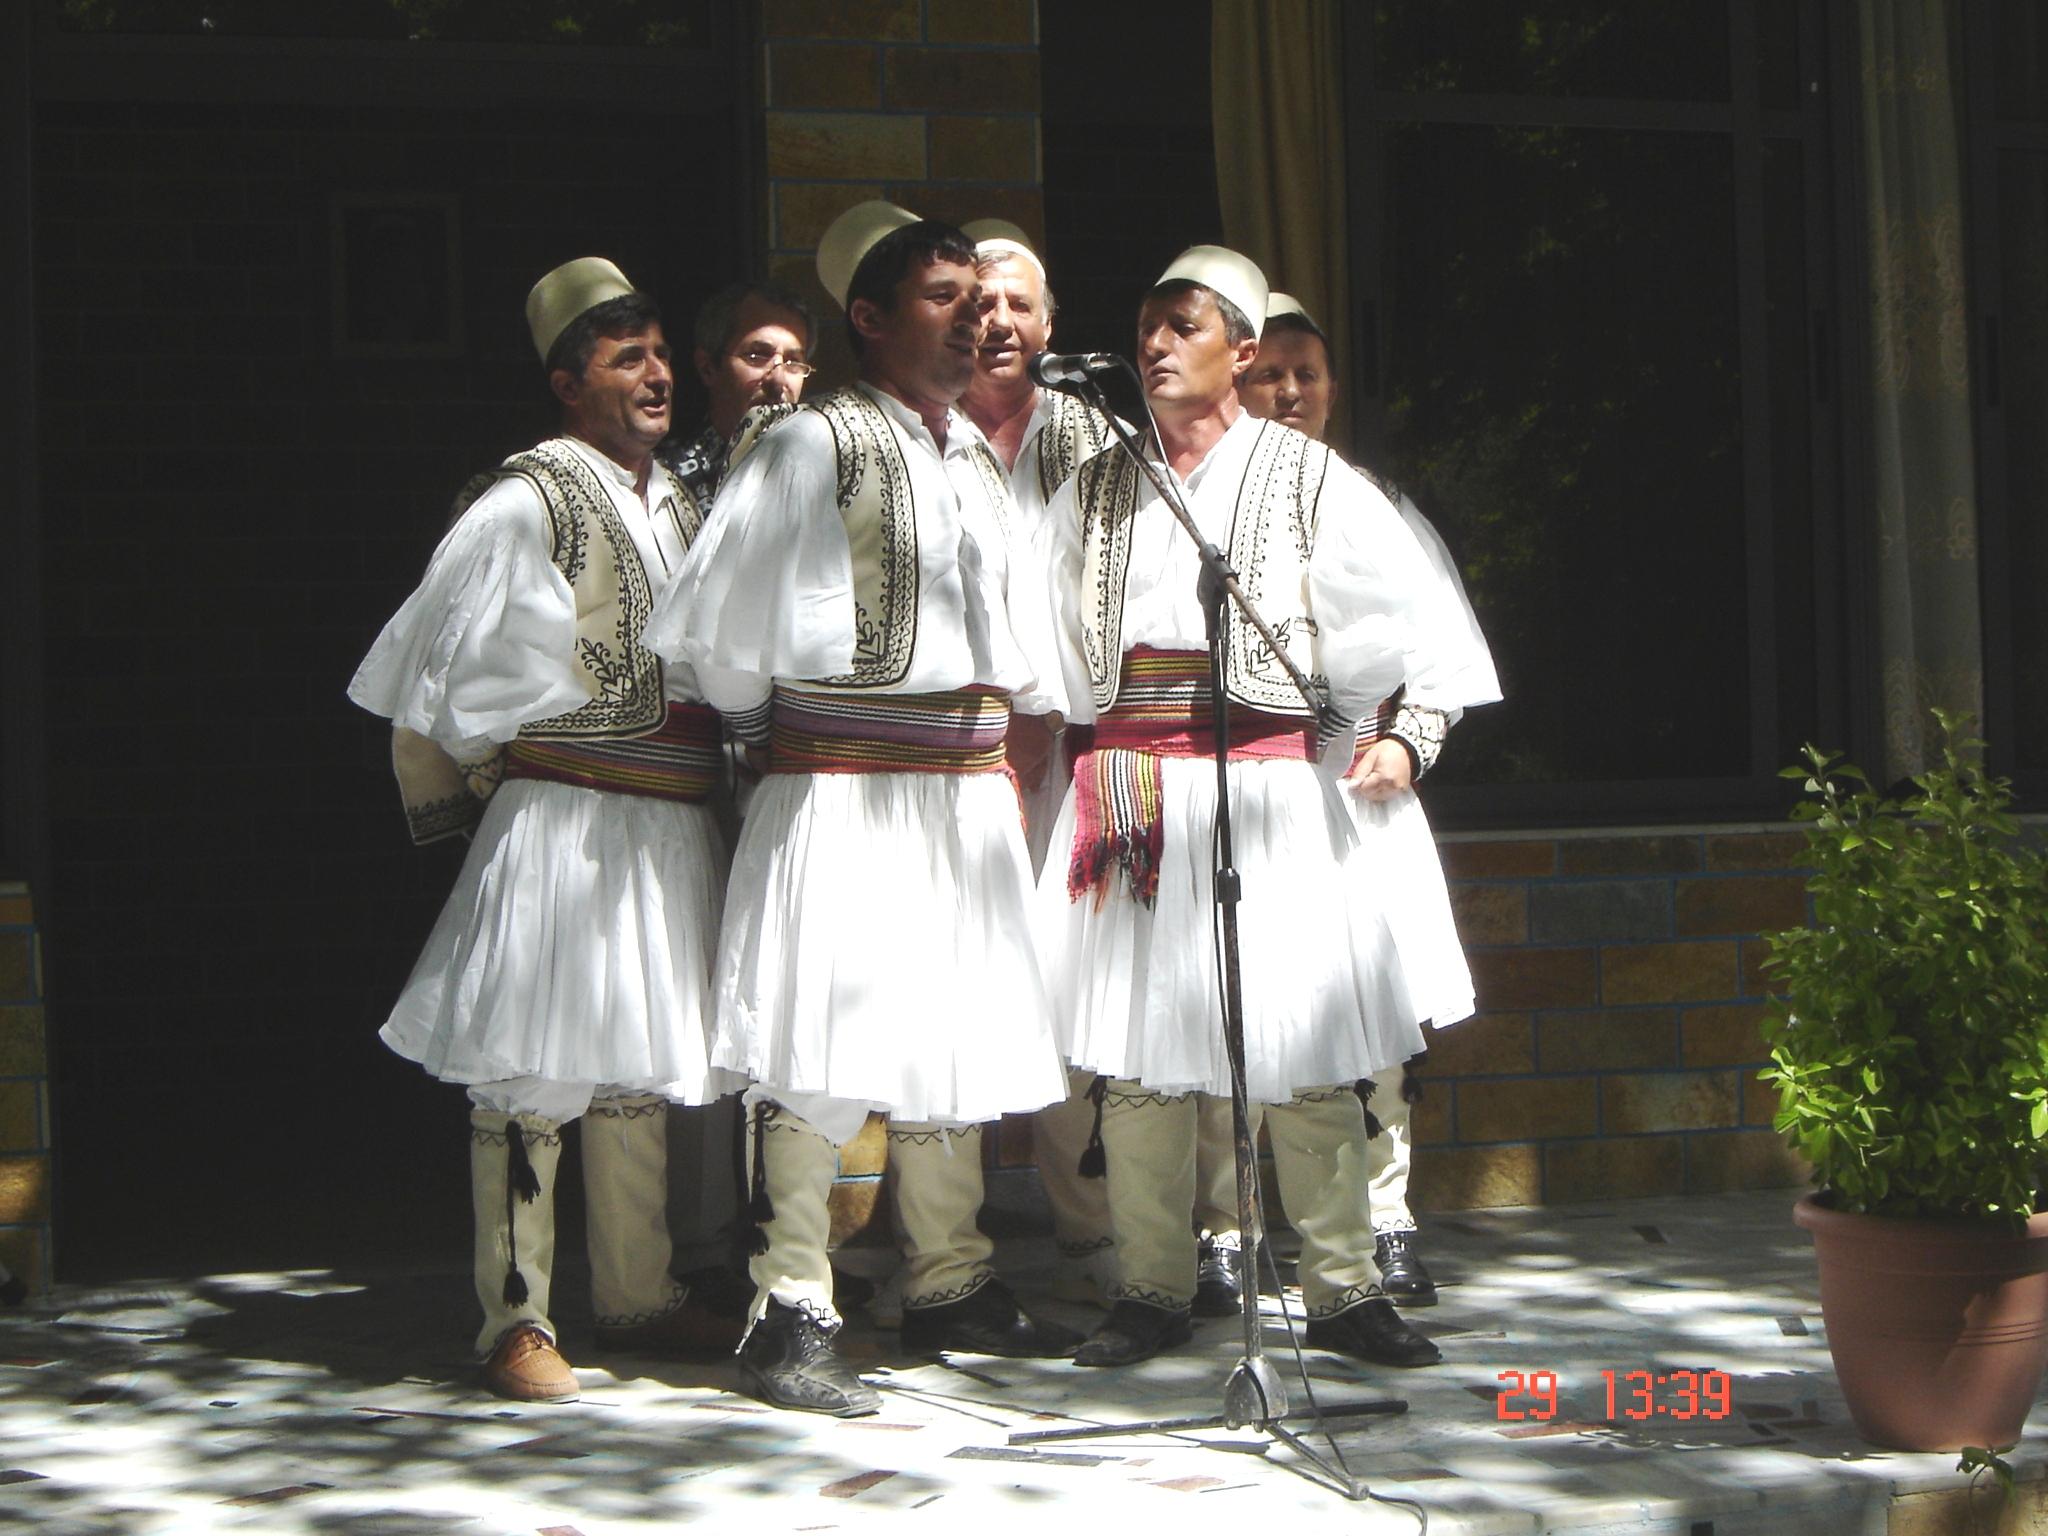 Grupo de música tradicional albanesa de Skrapar